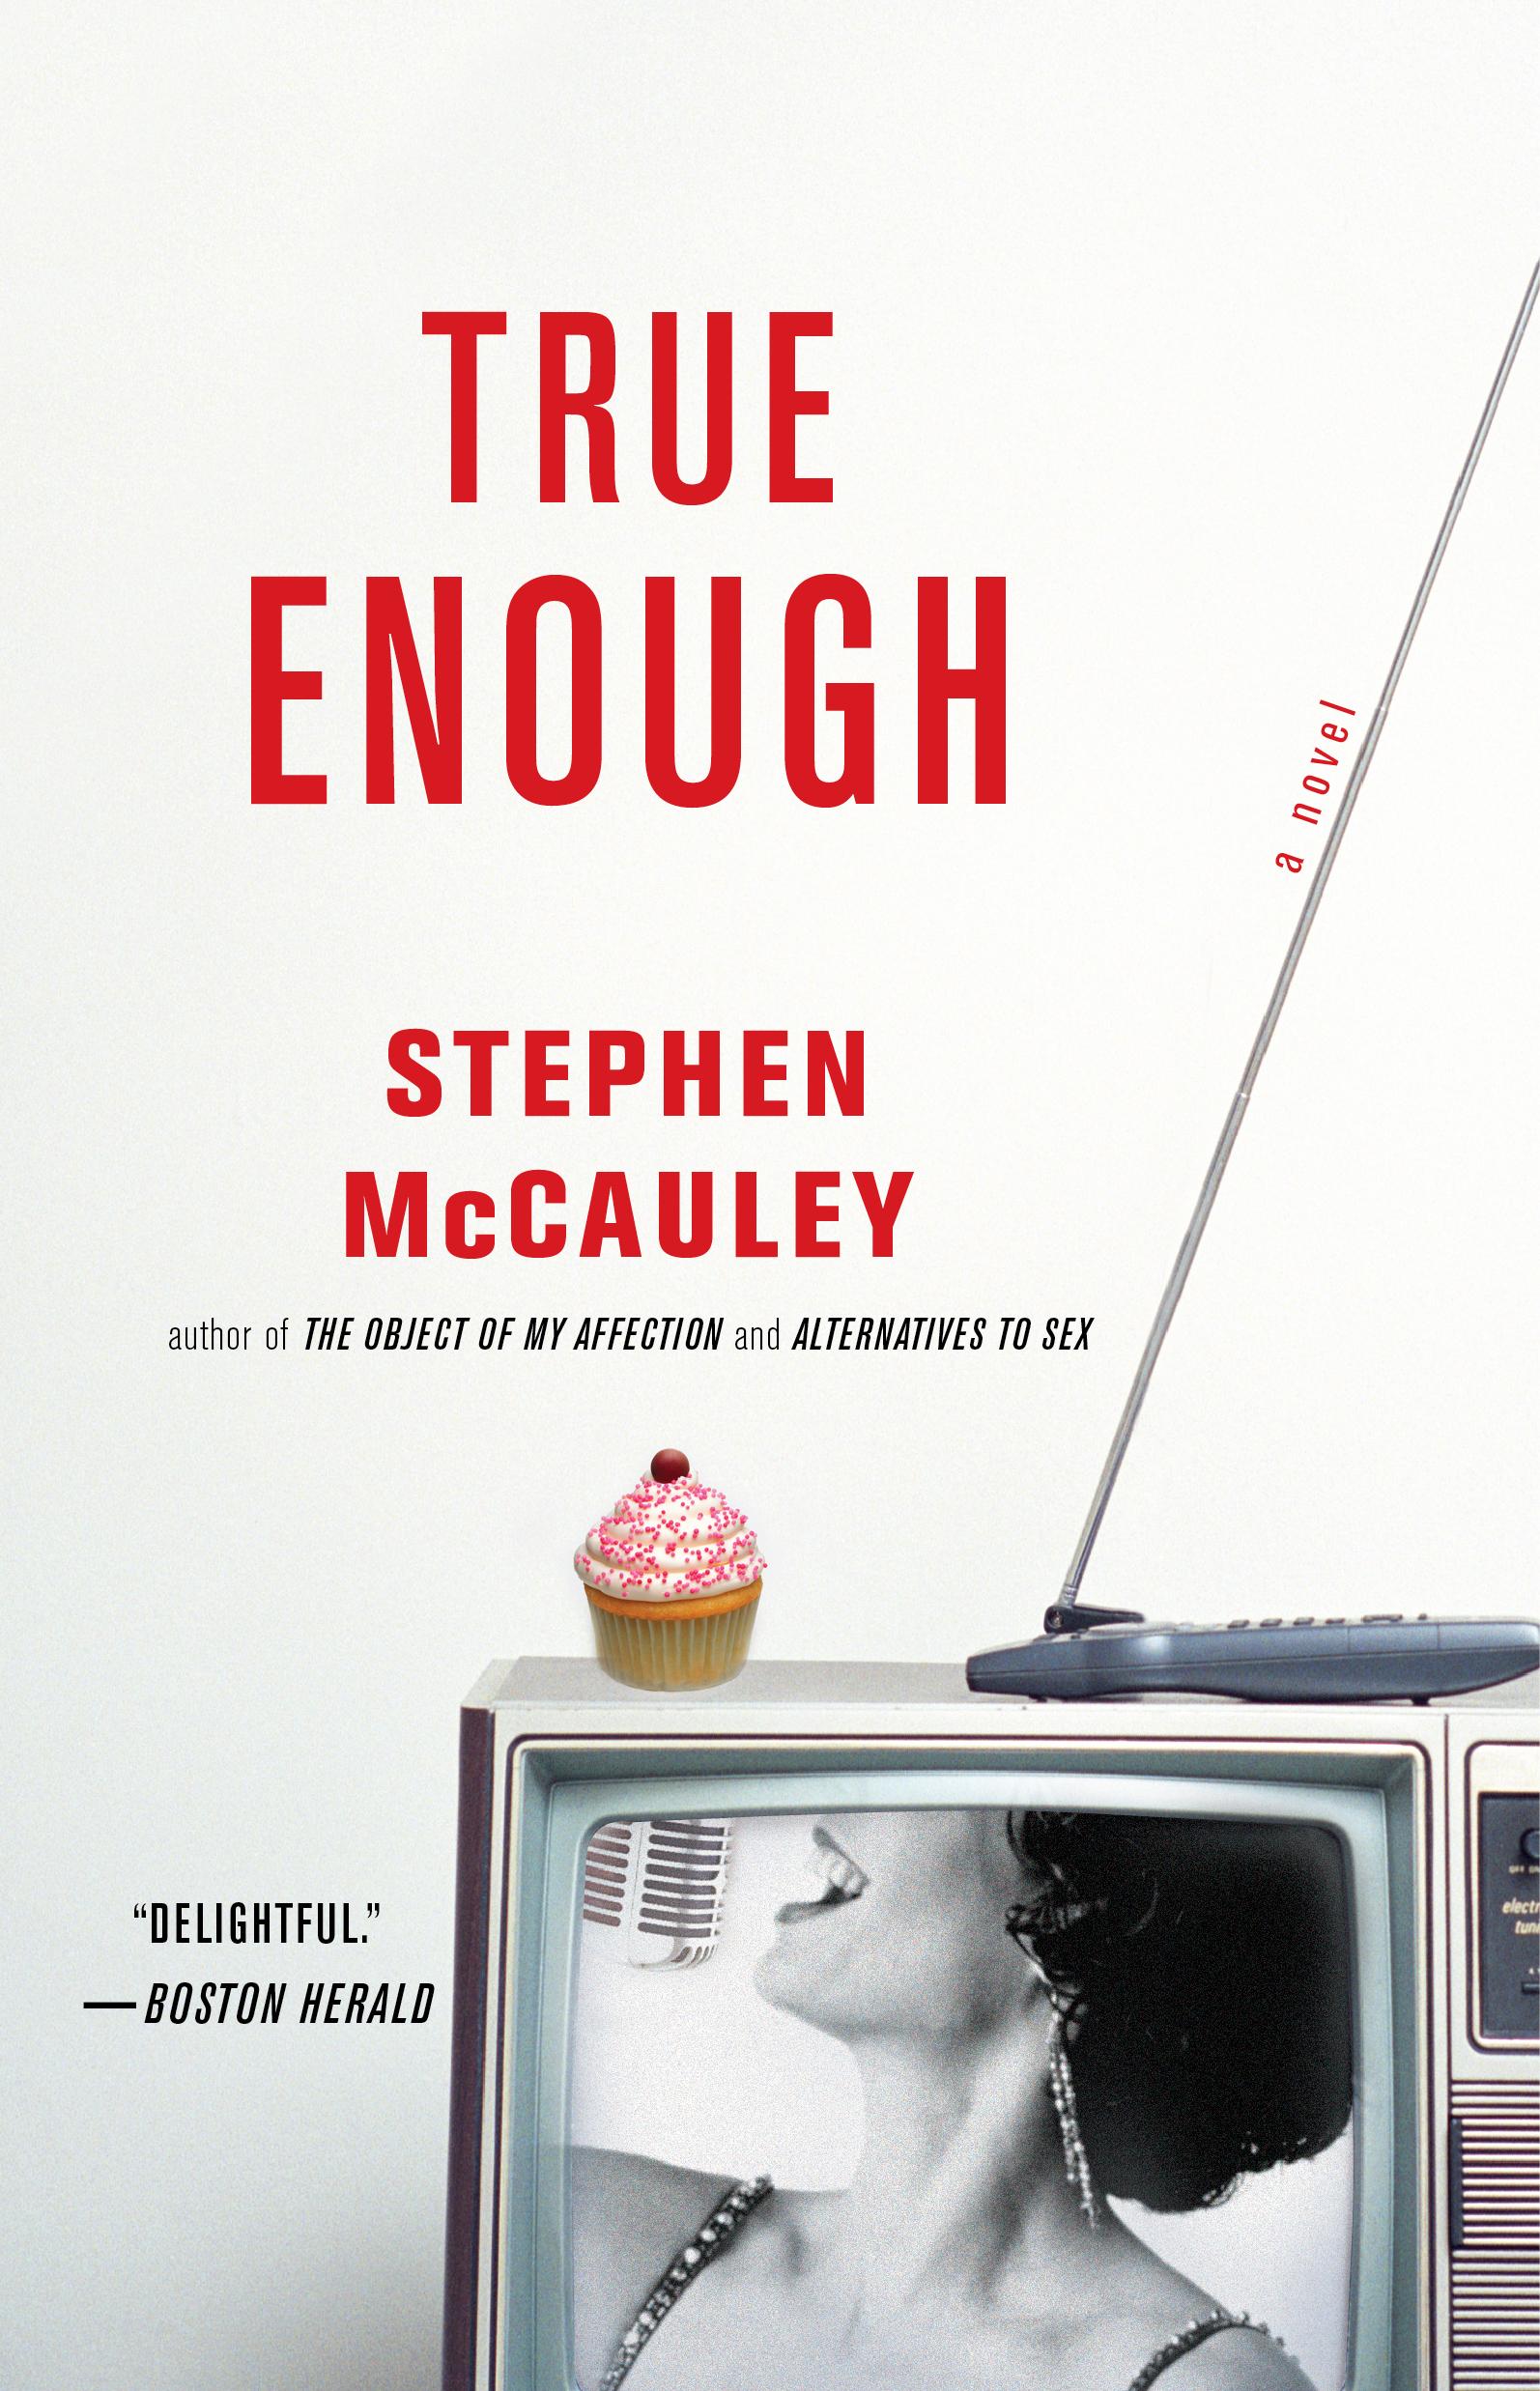 Book Cover Image (jpg): True Enough